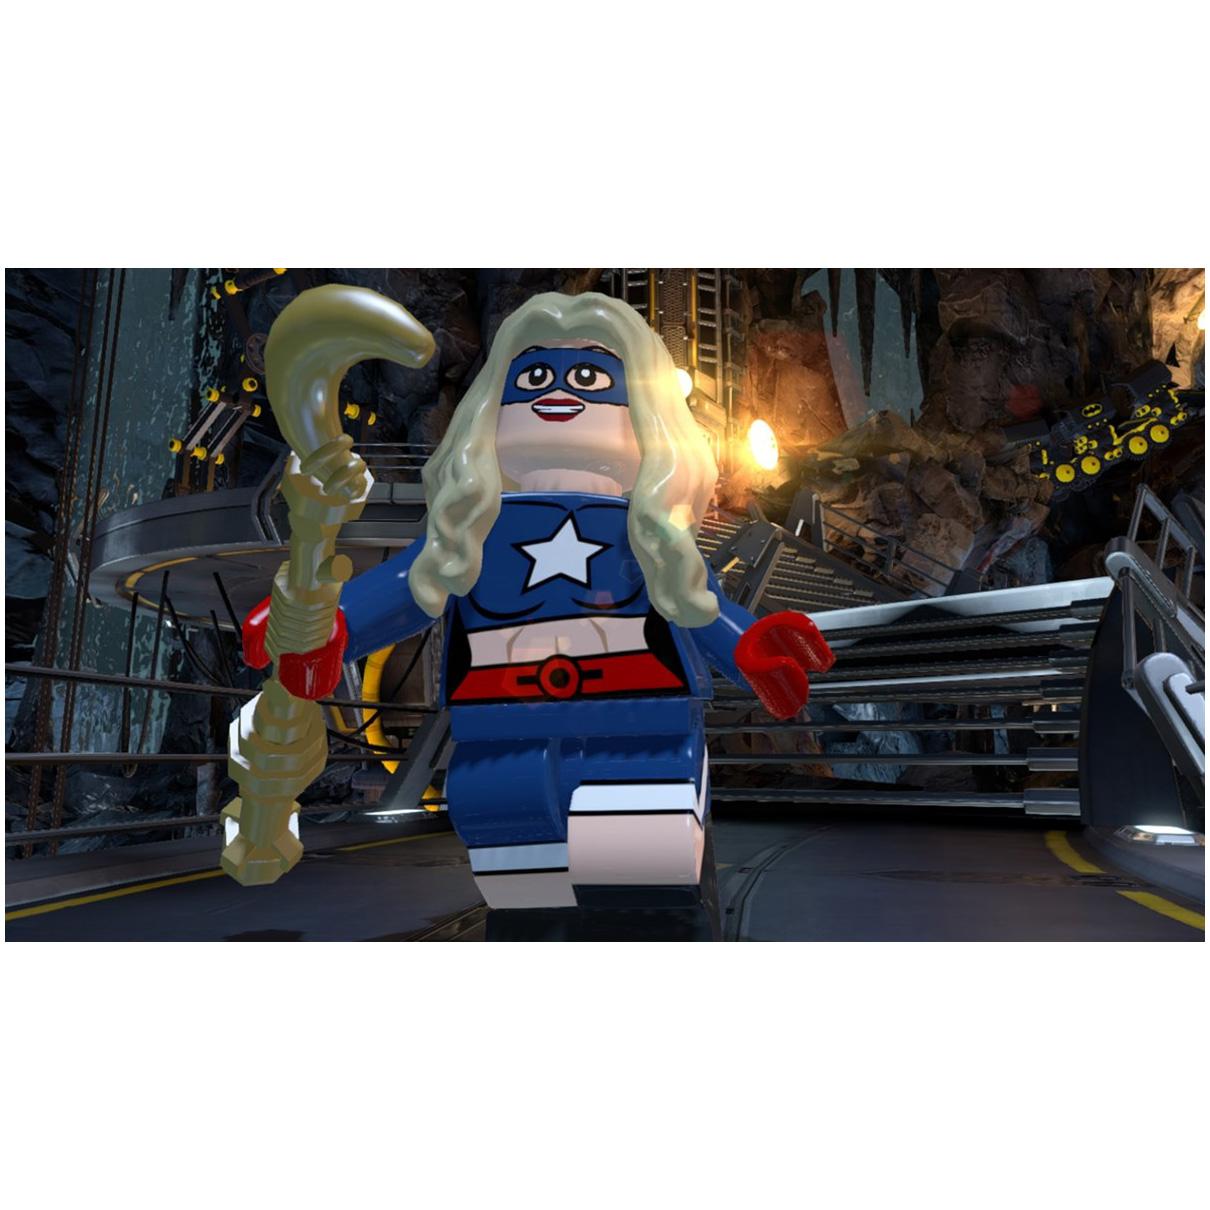 Joc Lego Batman 3: Beyond Gotham HITS pentru PlayStation 4 3